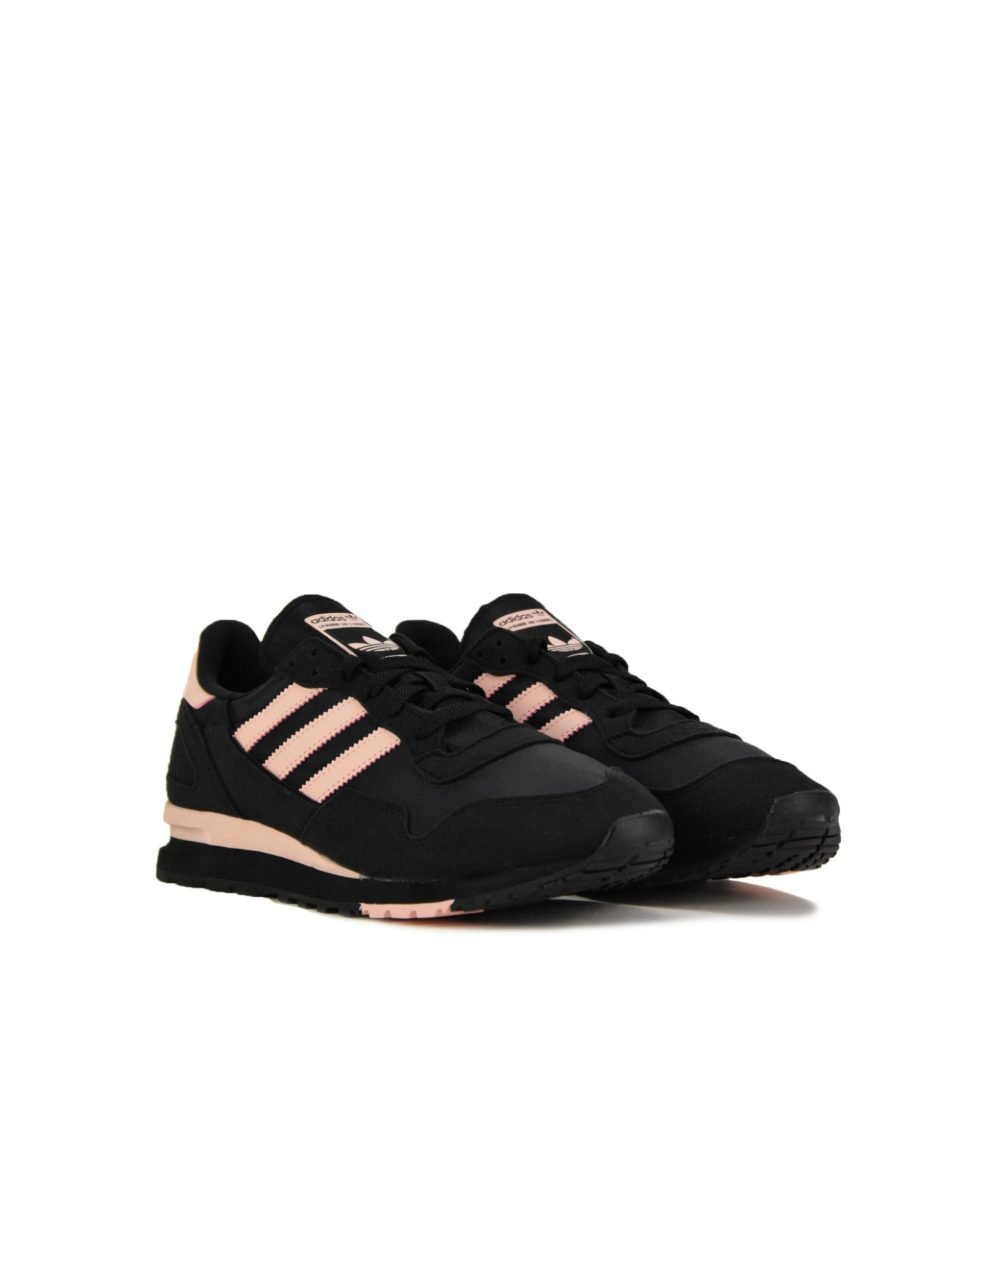 Adidas Lowertree (EF4464) Black/Pink